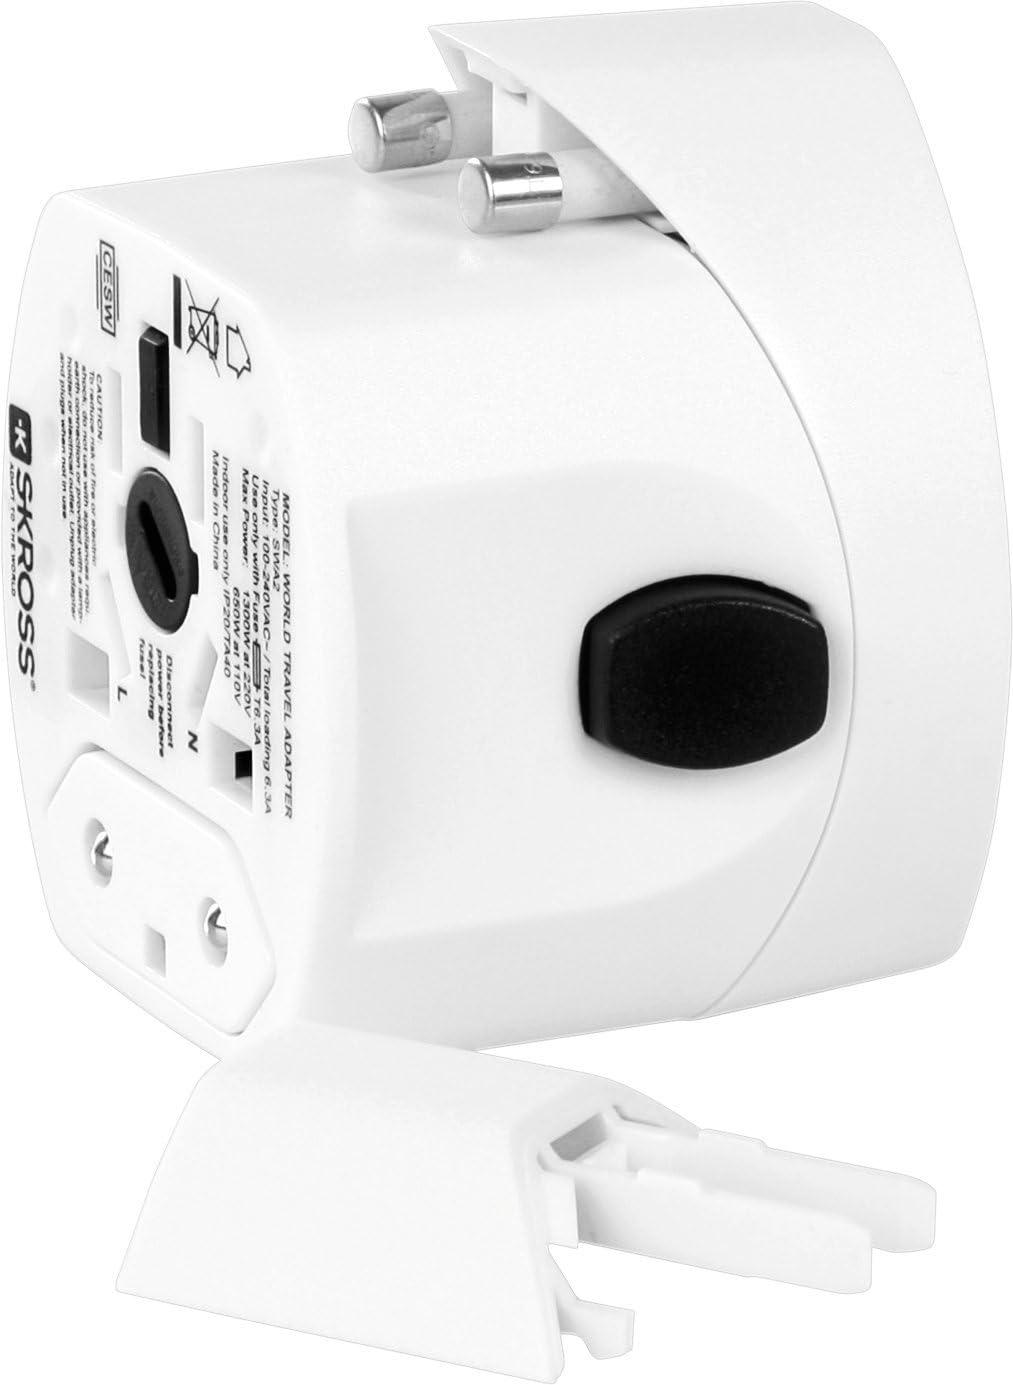 Adaptateur de voyage universel EVO USB 1.302101 Skross